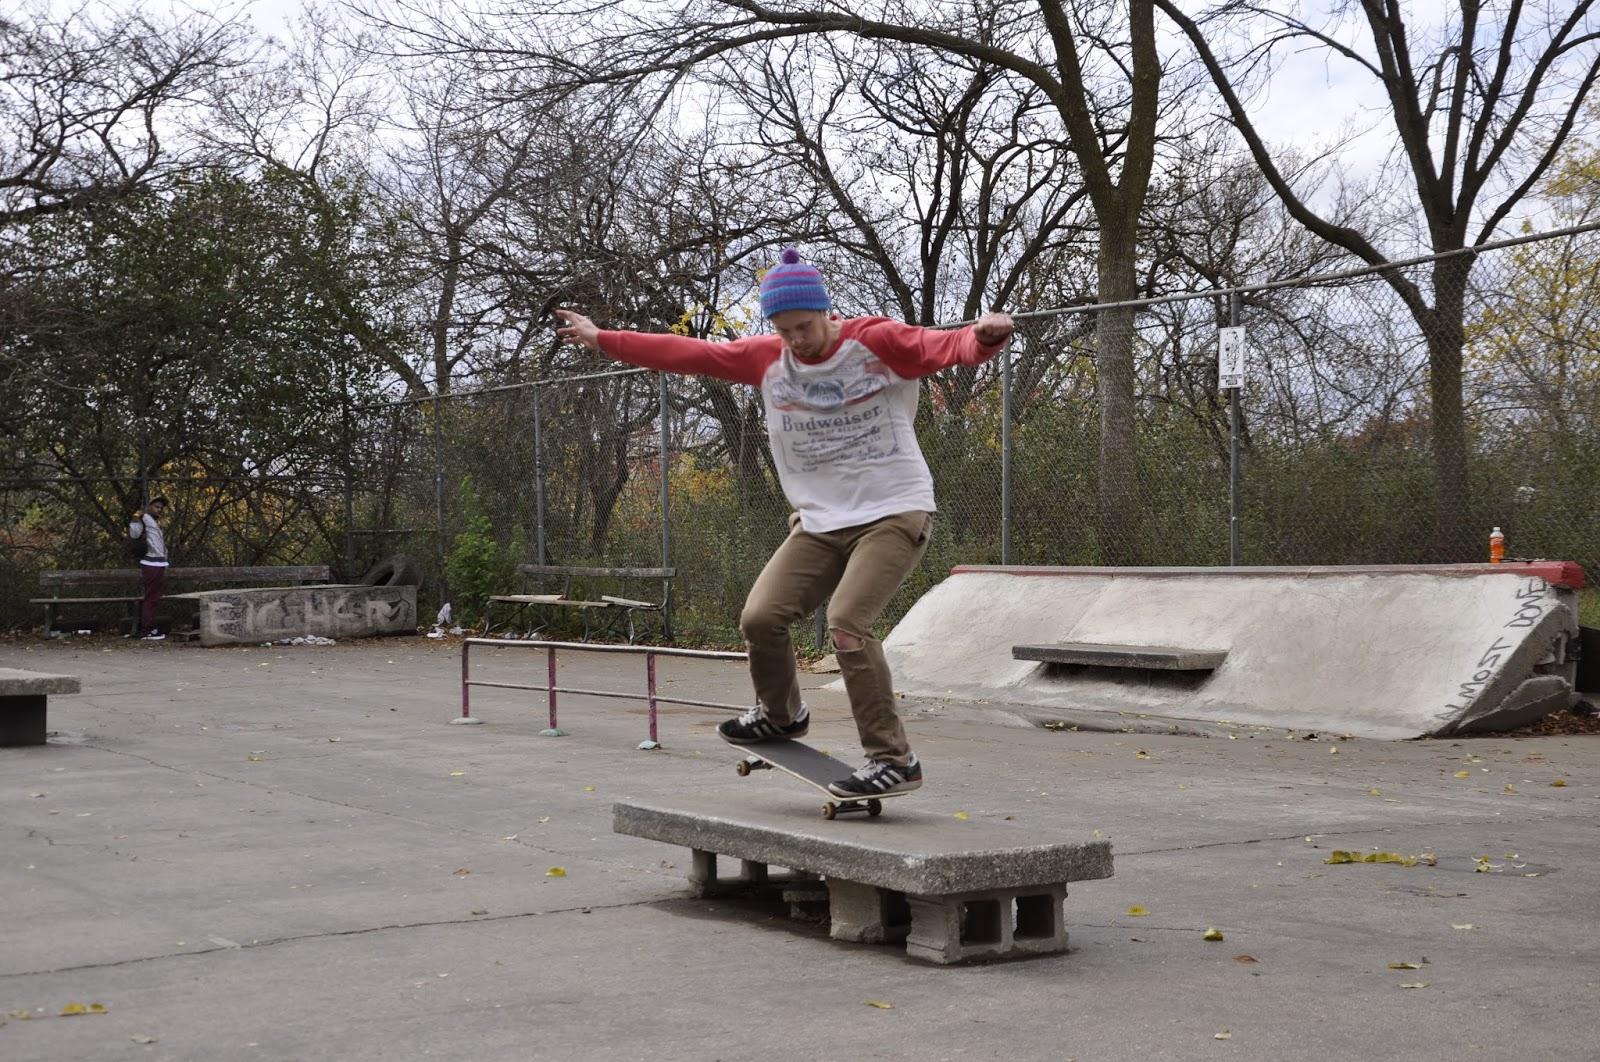 Milwaukee Area Parks: Skateboarding in Milwaukee